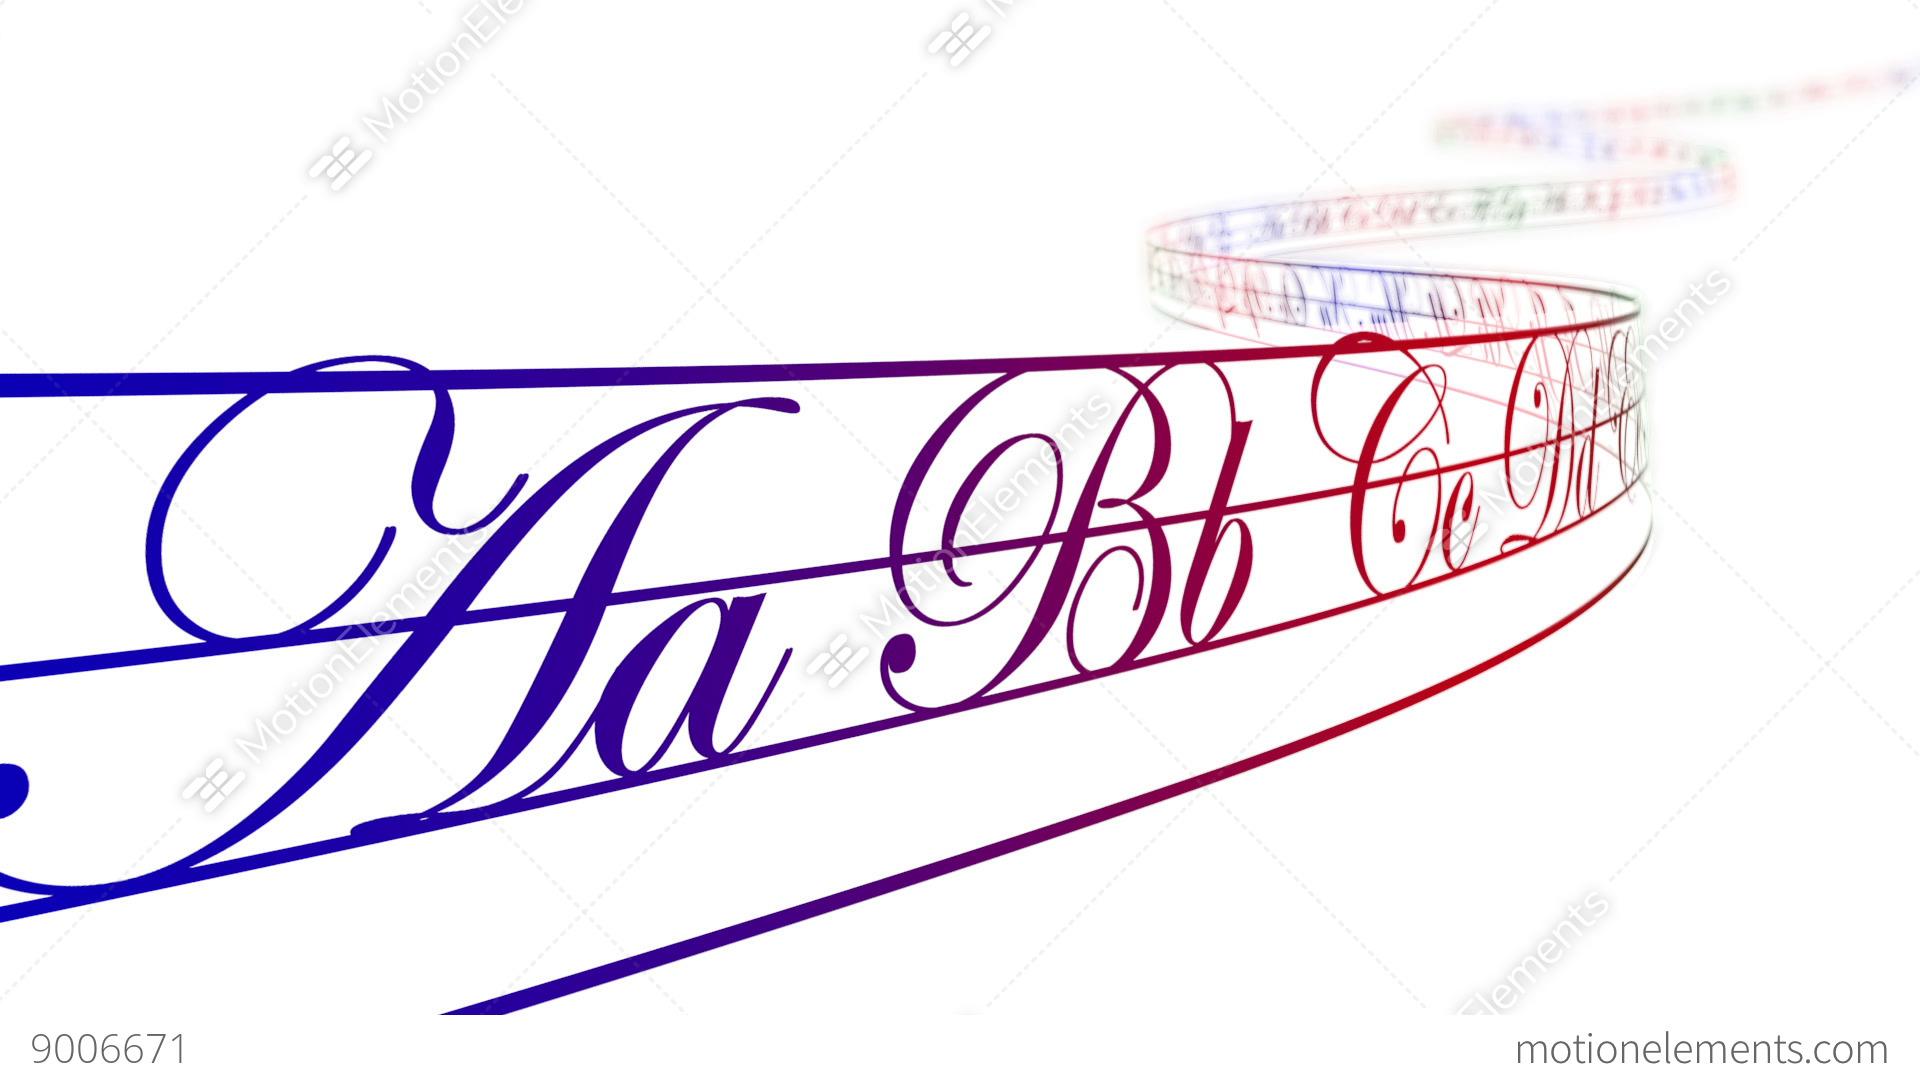 Letter a images hd formal letter template fa letter hd fa altavistaventures Gallery